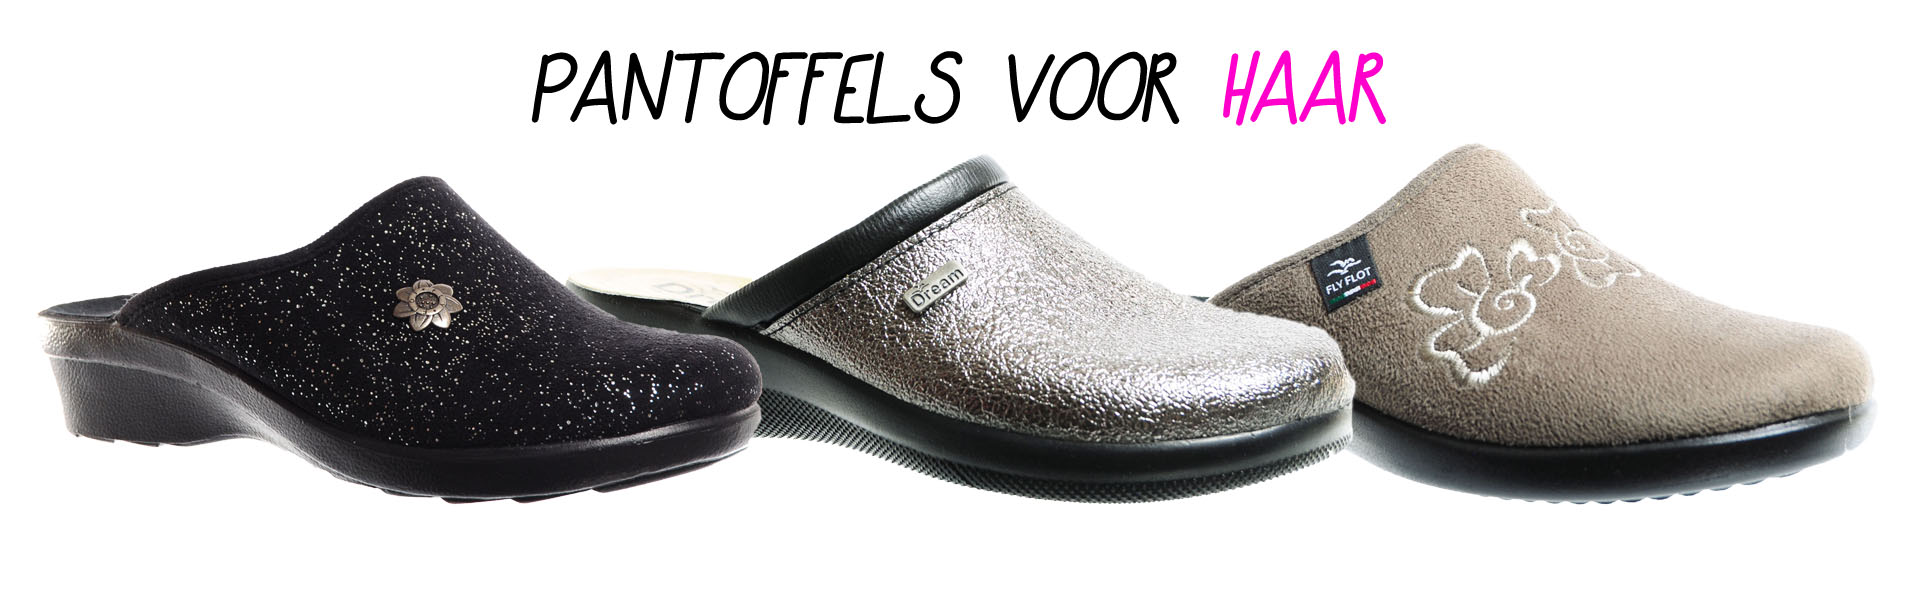 Fly Flot Pantoffels voor Dames